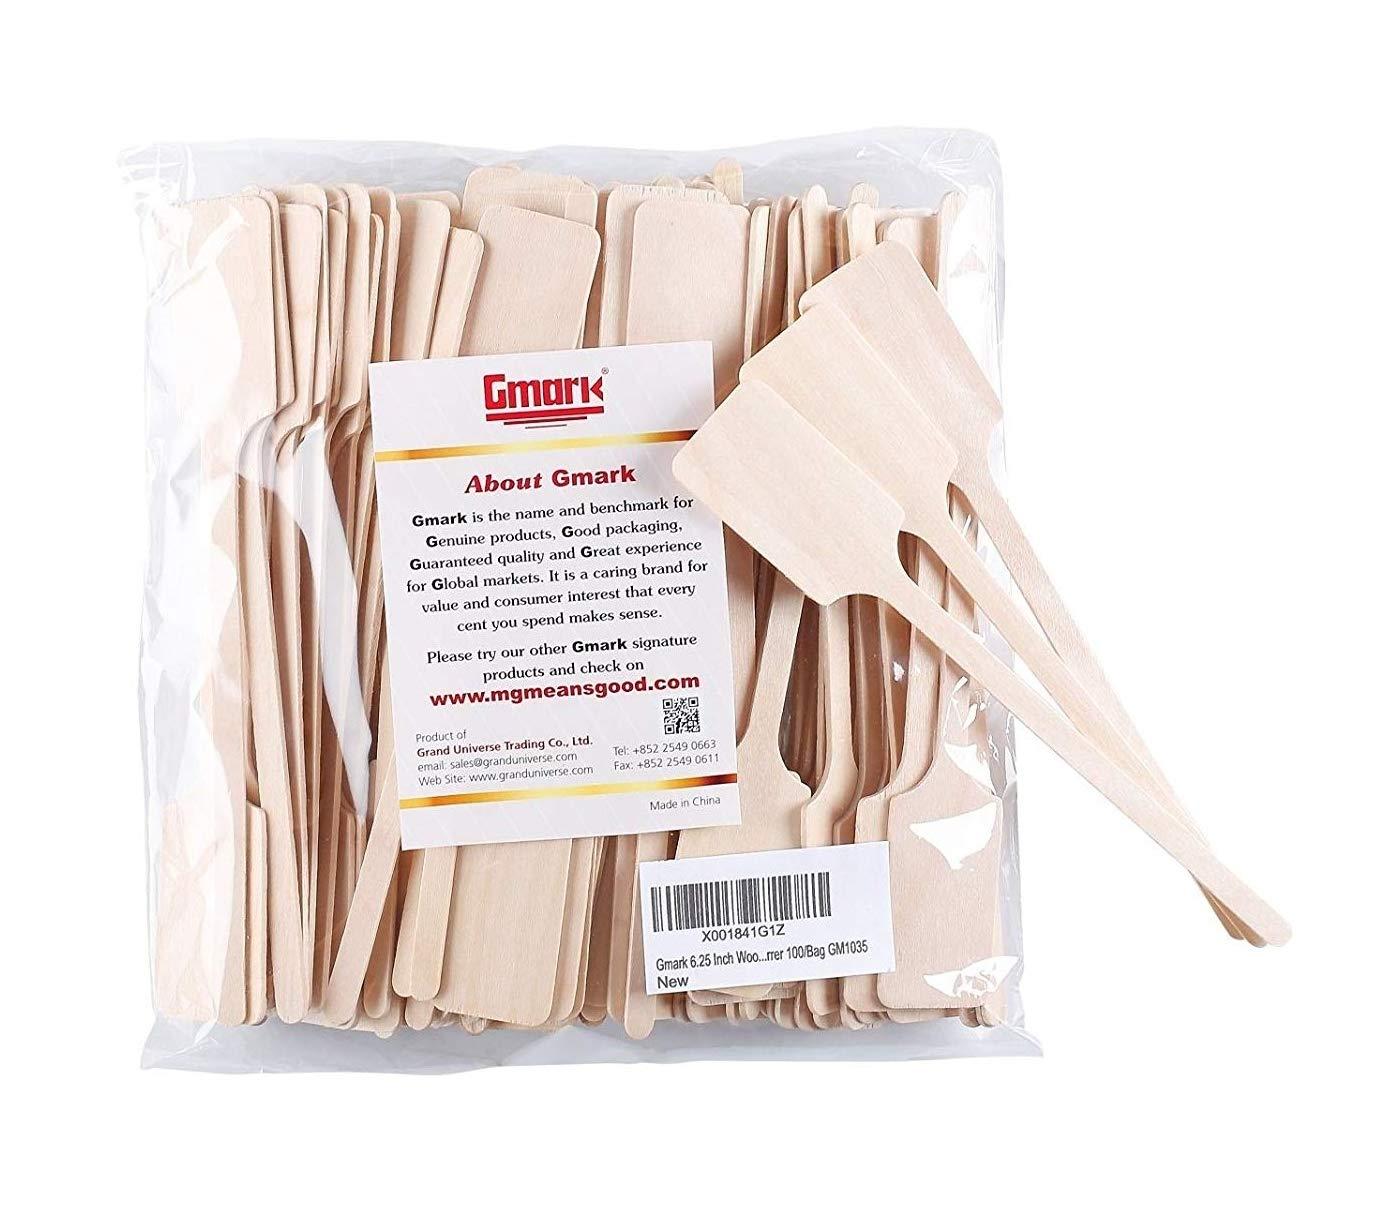 Gmark Green Product 6.25 Inch Wood Kayak Paddle Shape Sticks, Wood Stirrer for Honey, 100/Bag GM1035 by Gmark (Image #1)